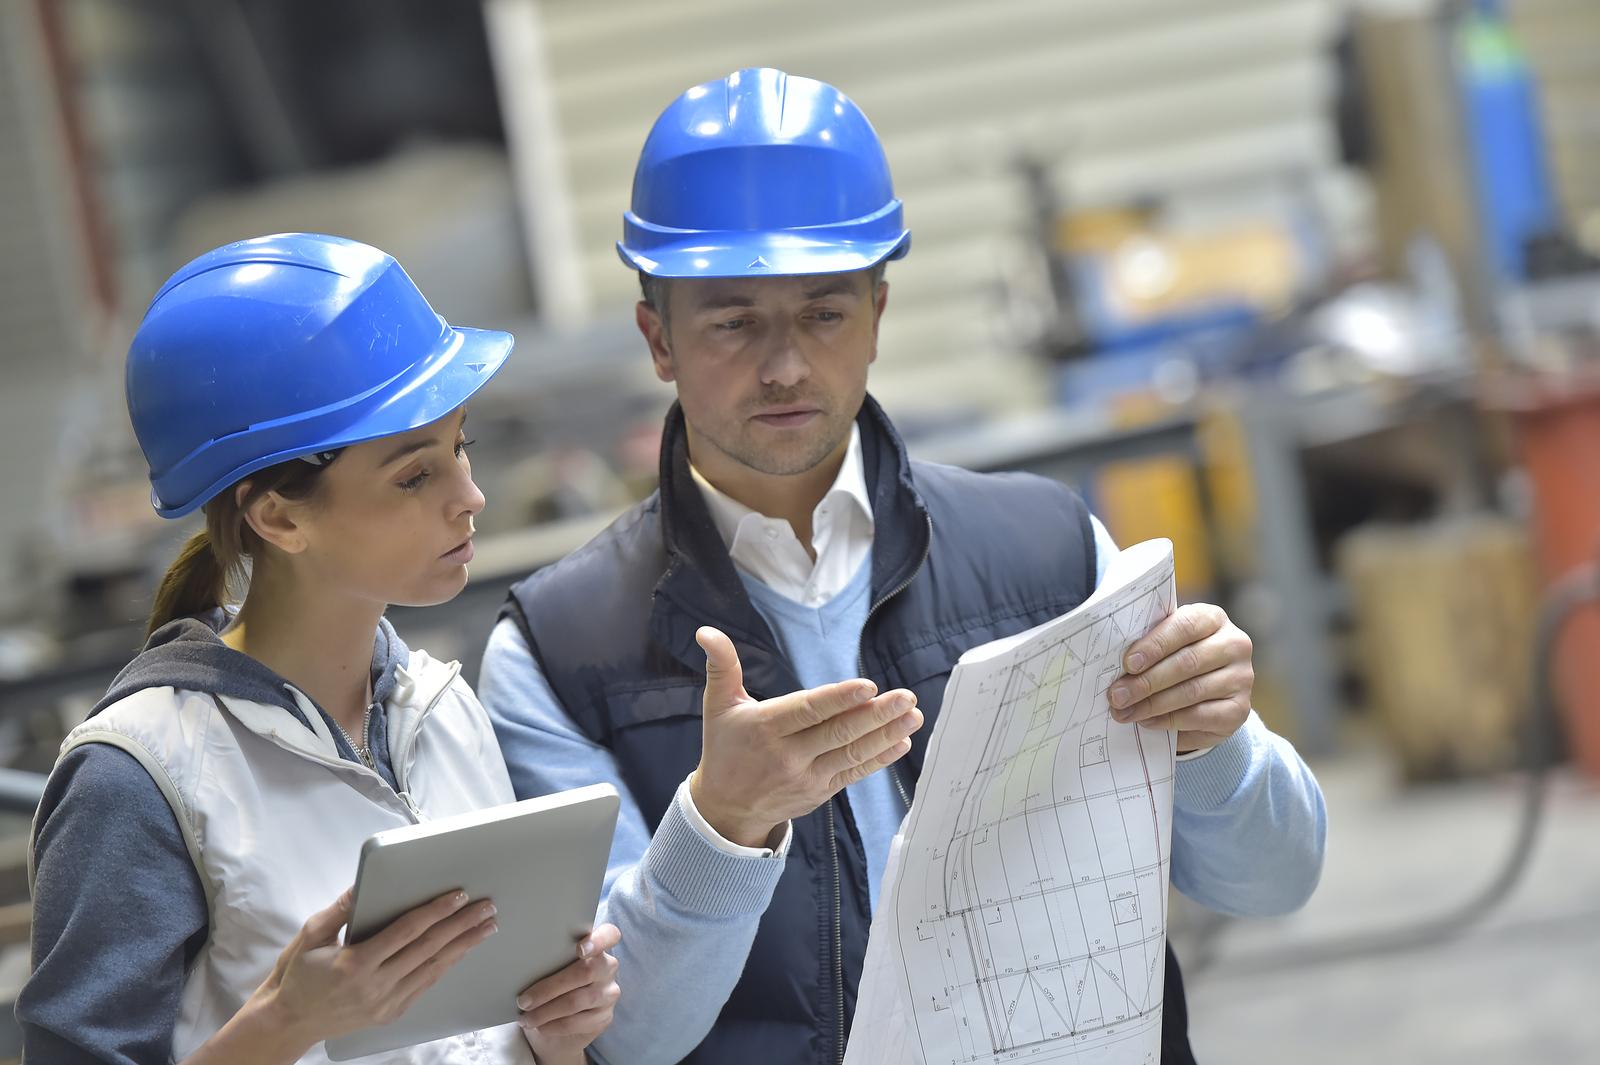 dos ingenieros revisan documentación